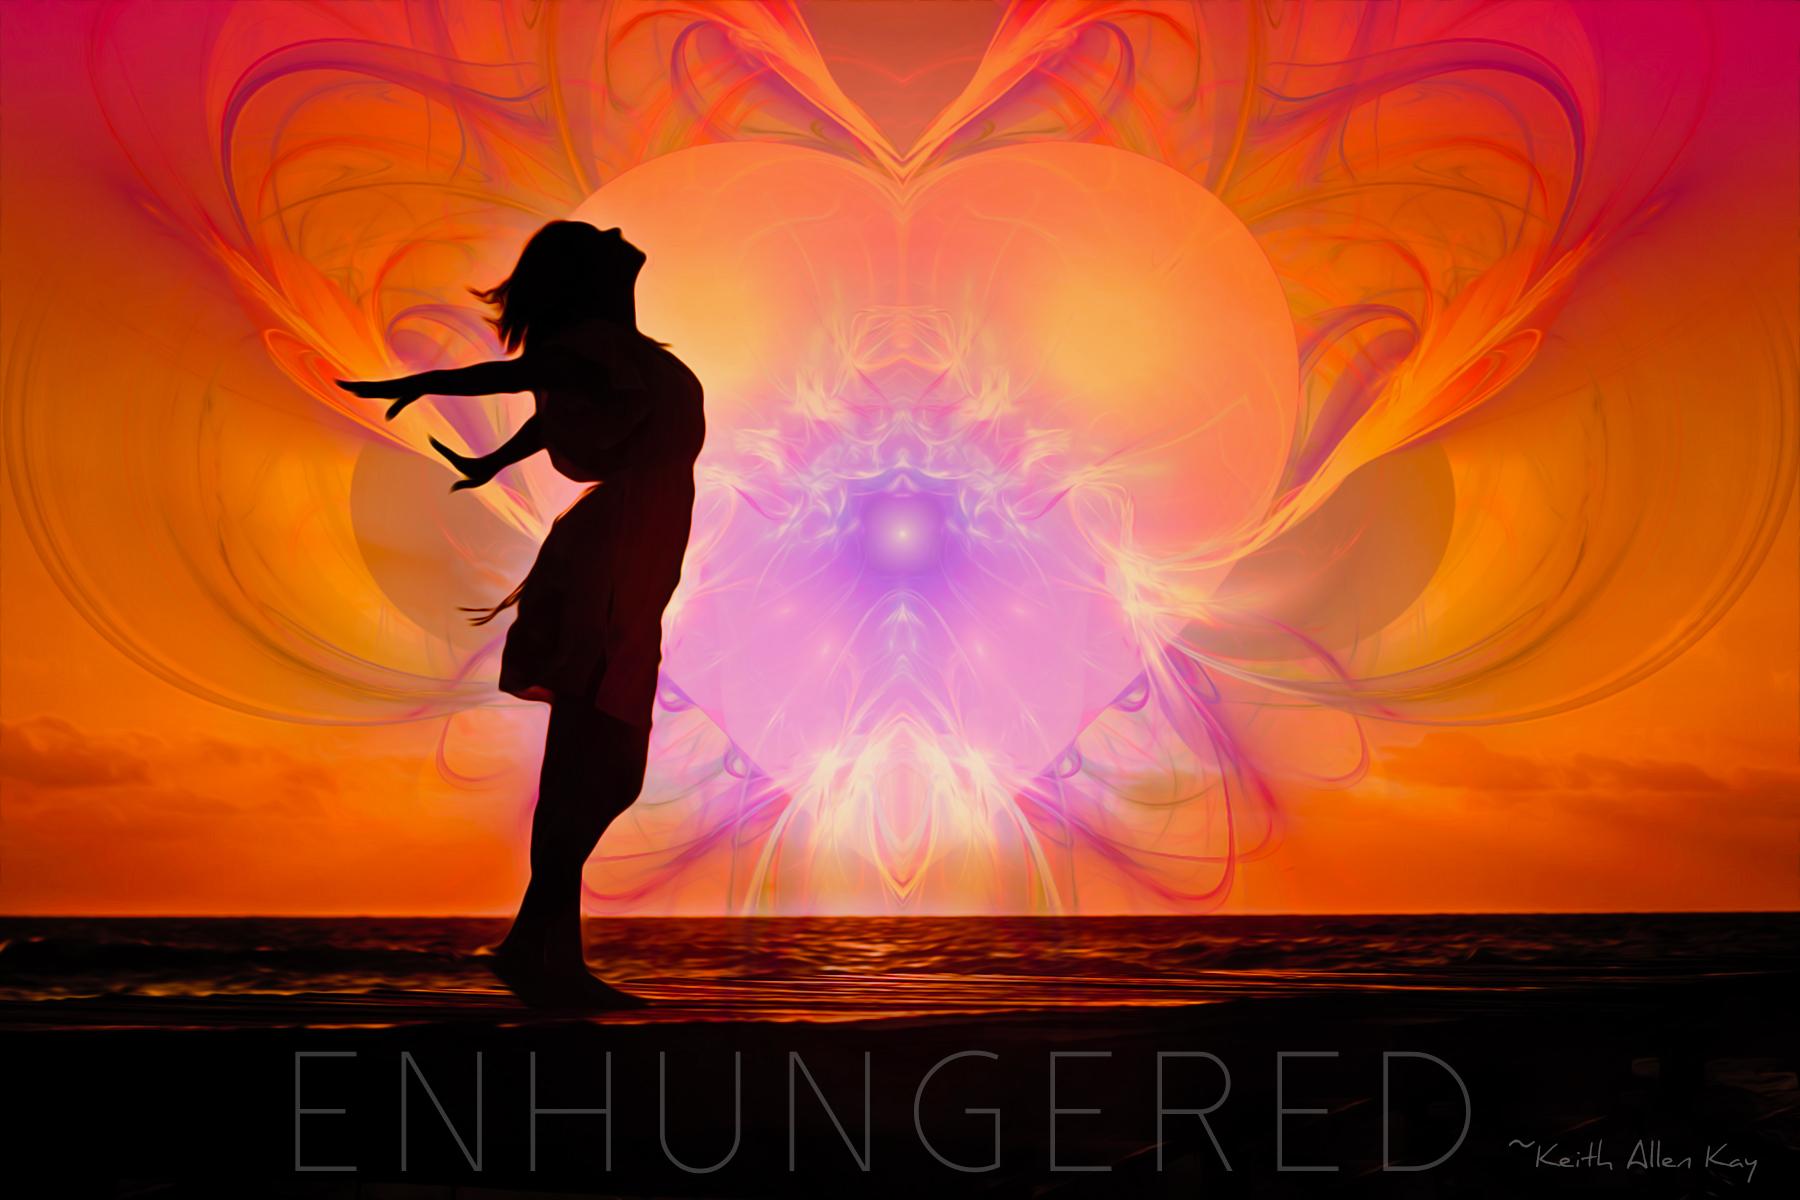 Enhungered